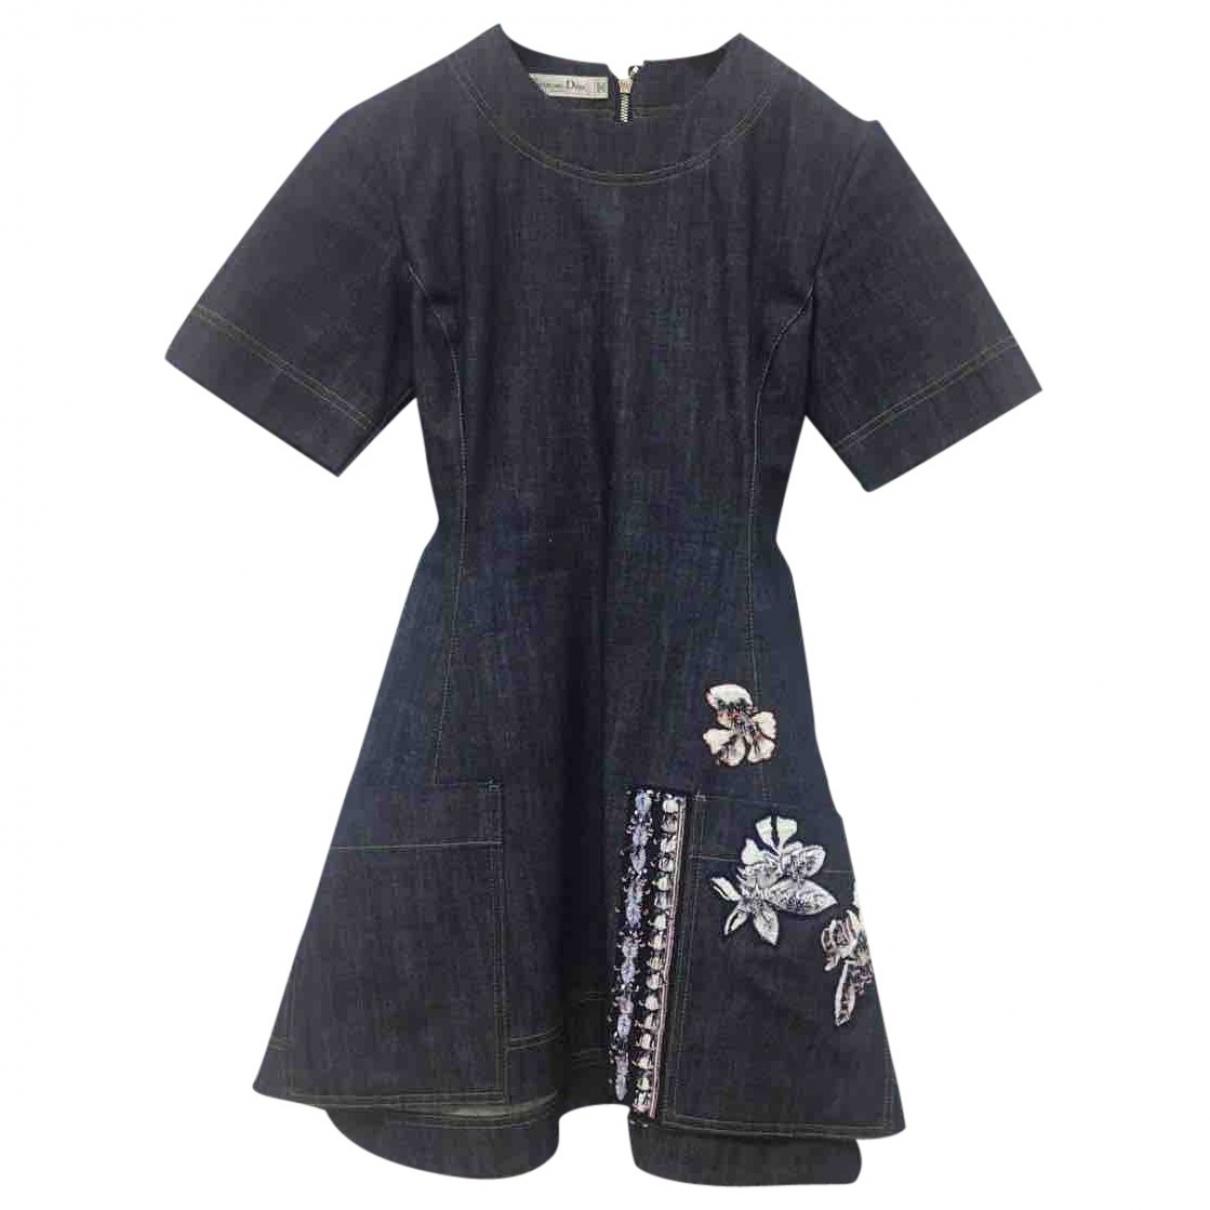 Dior \N Blue Denim - Jeans dress for Women 34 FR